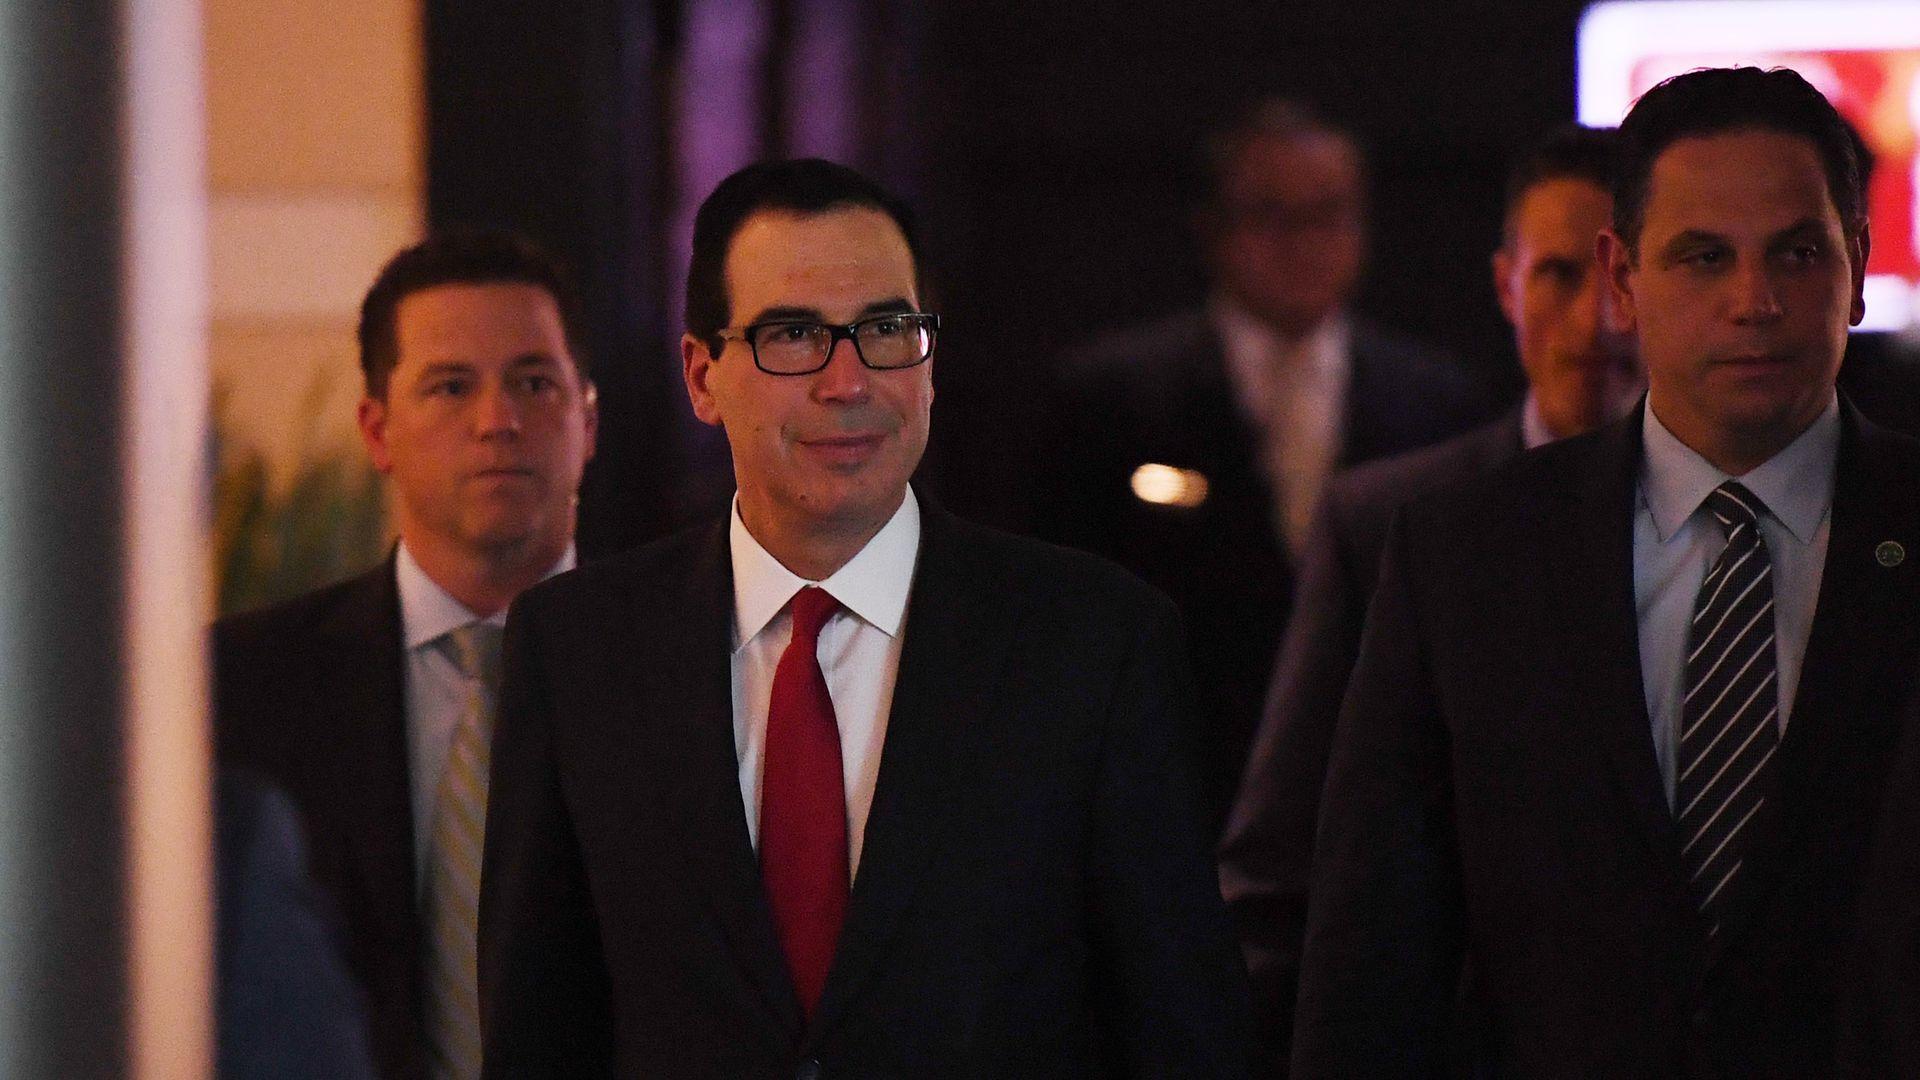 Treasury Secretary Steven Mnuchin heading to the U.S. embassy in Beijing for trade talks on May 3, 2018. Photo: Greg Baker/AFP via Getty Images